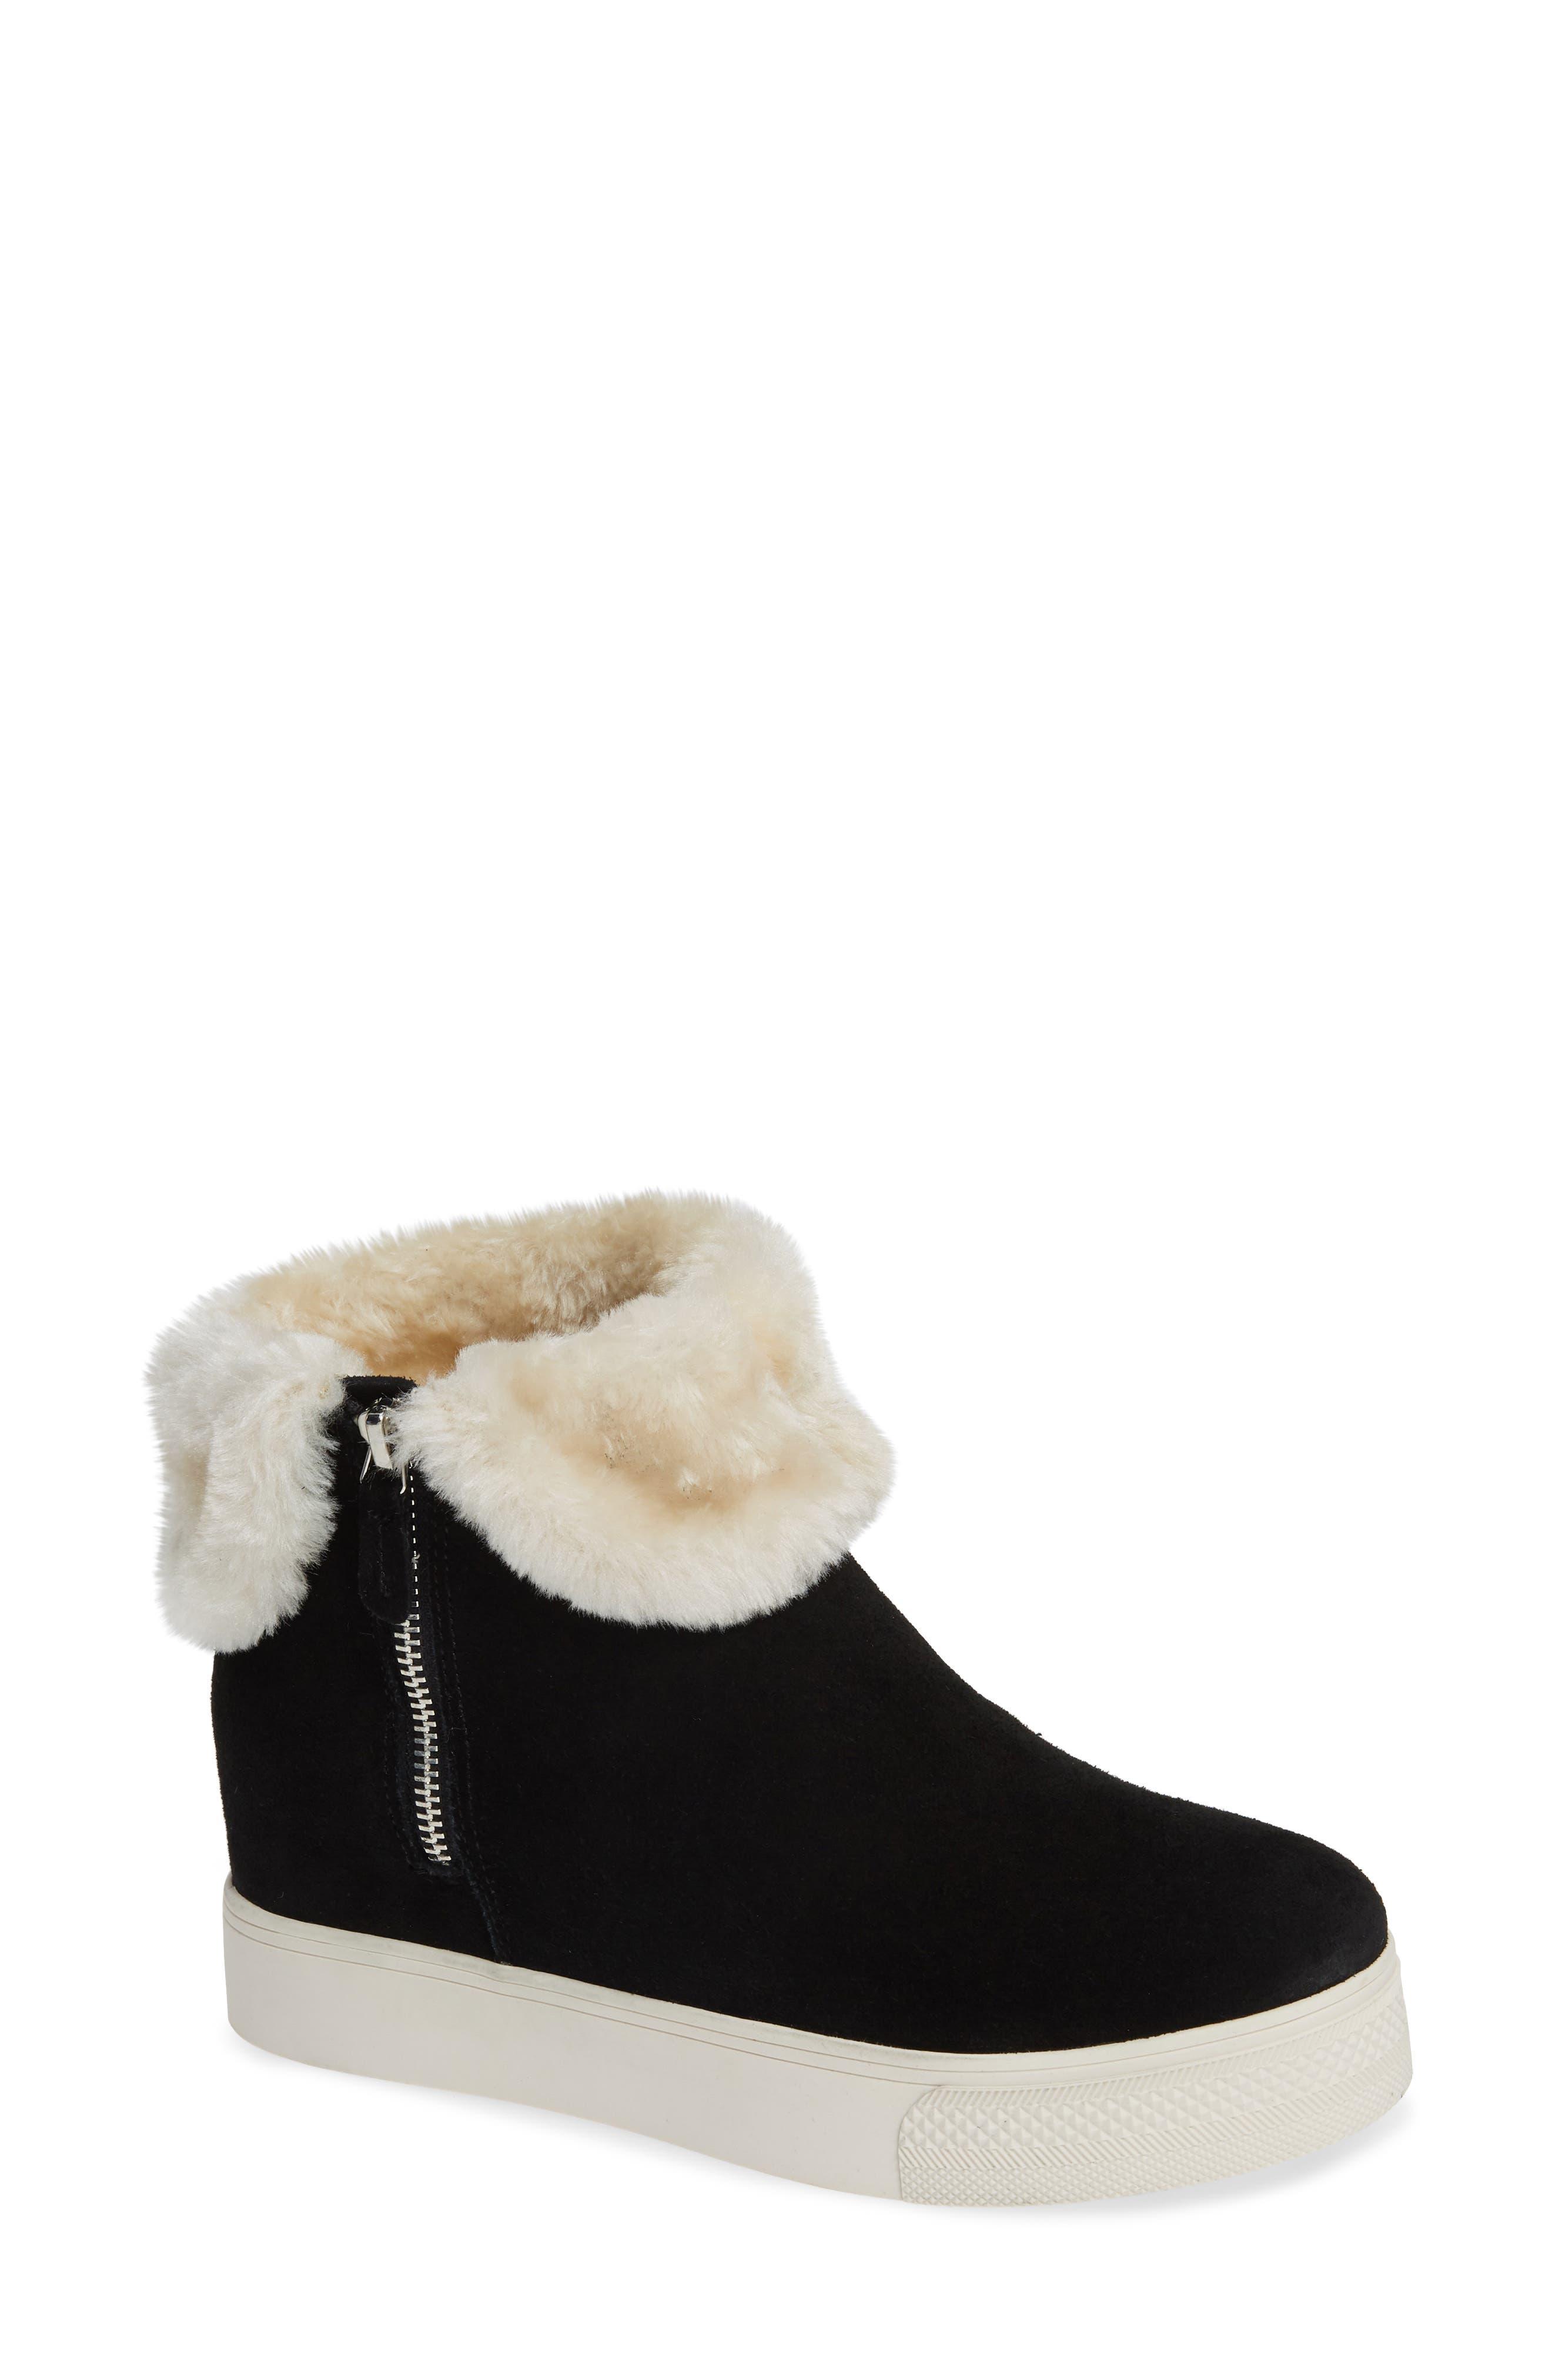 STEVE MADDEN Faux Fur Lined Sneaker, Main, color, 006